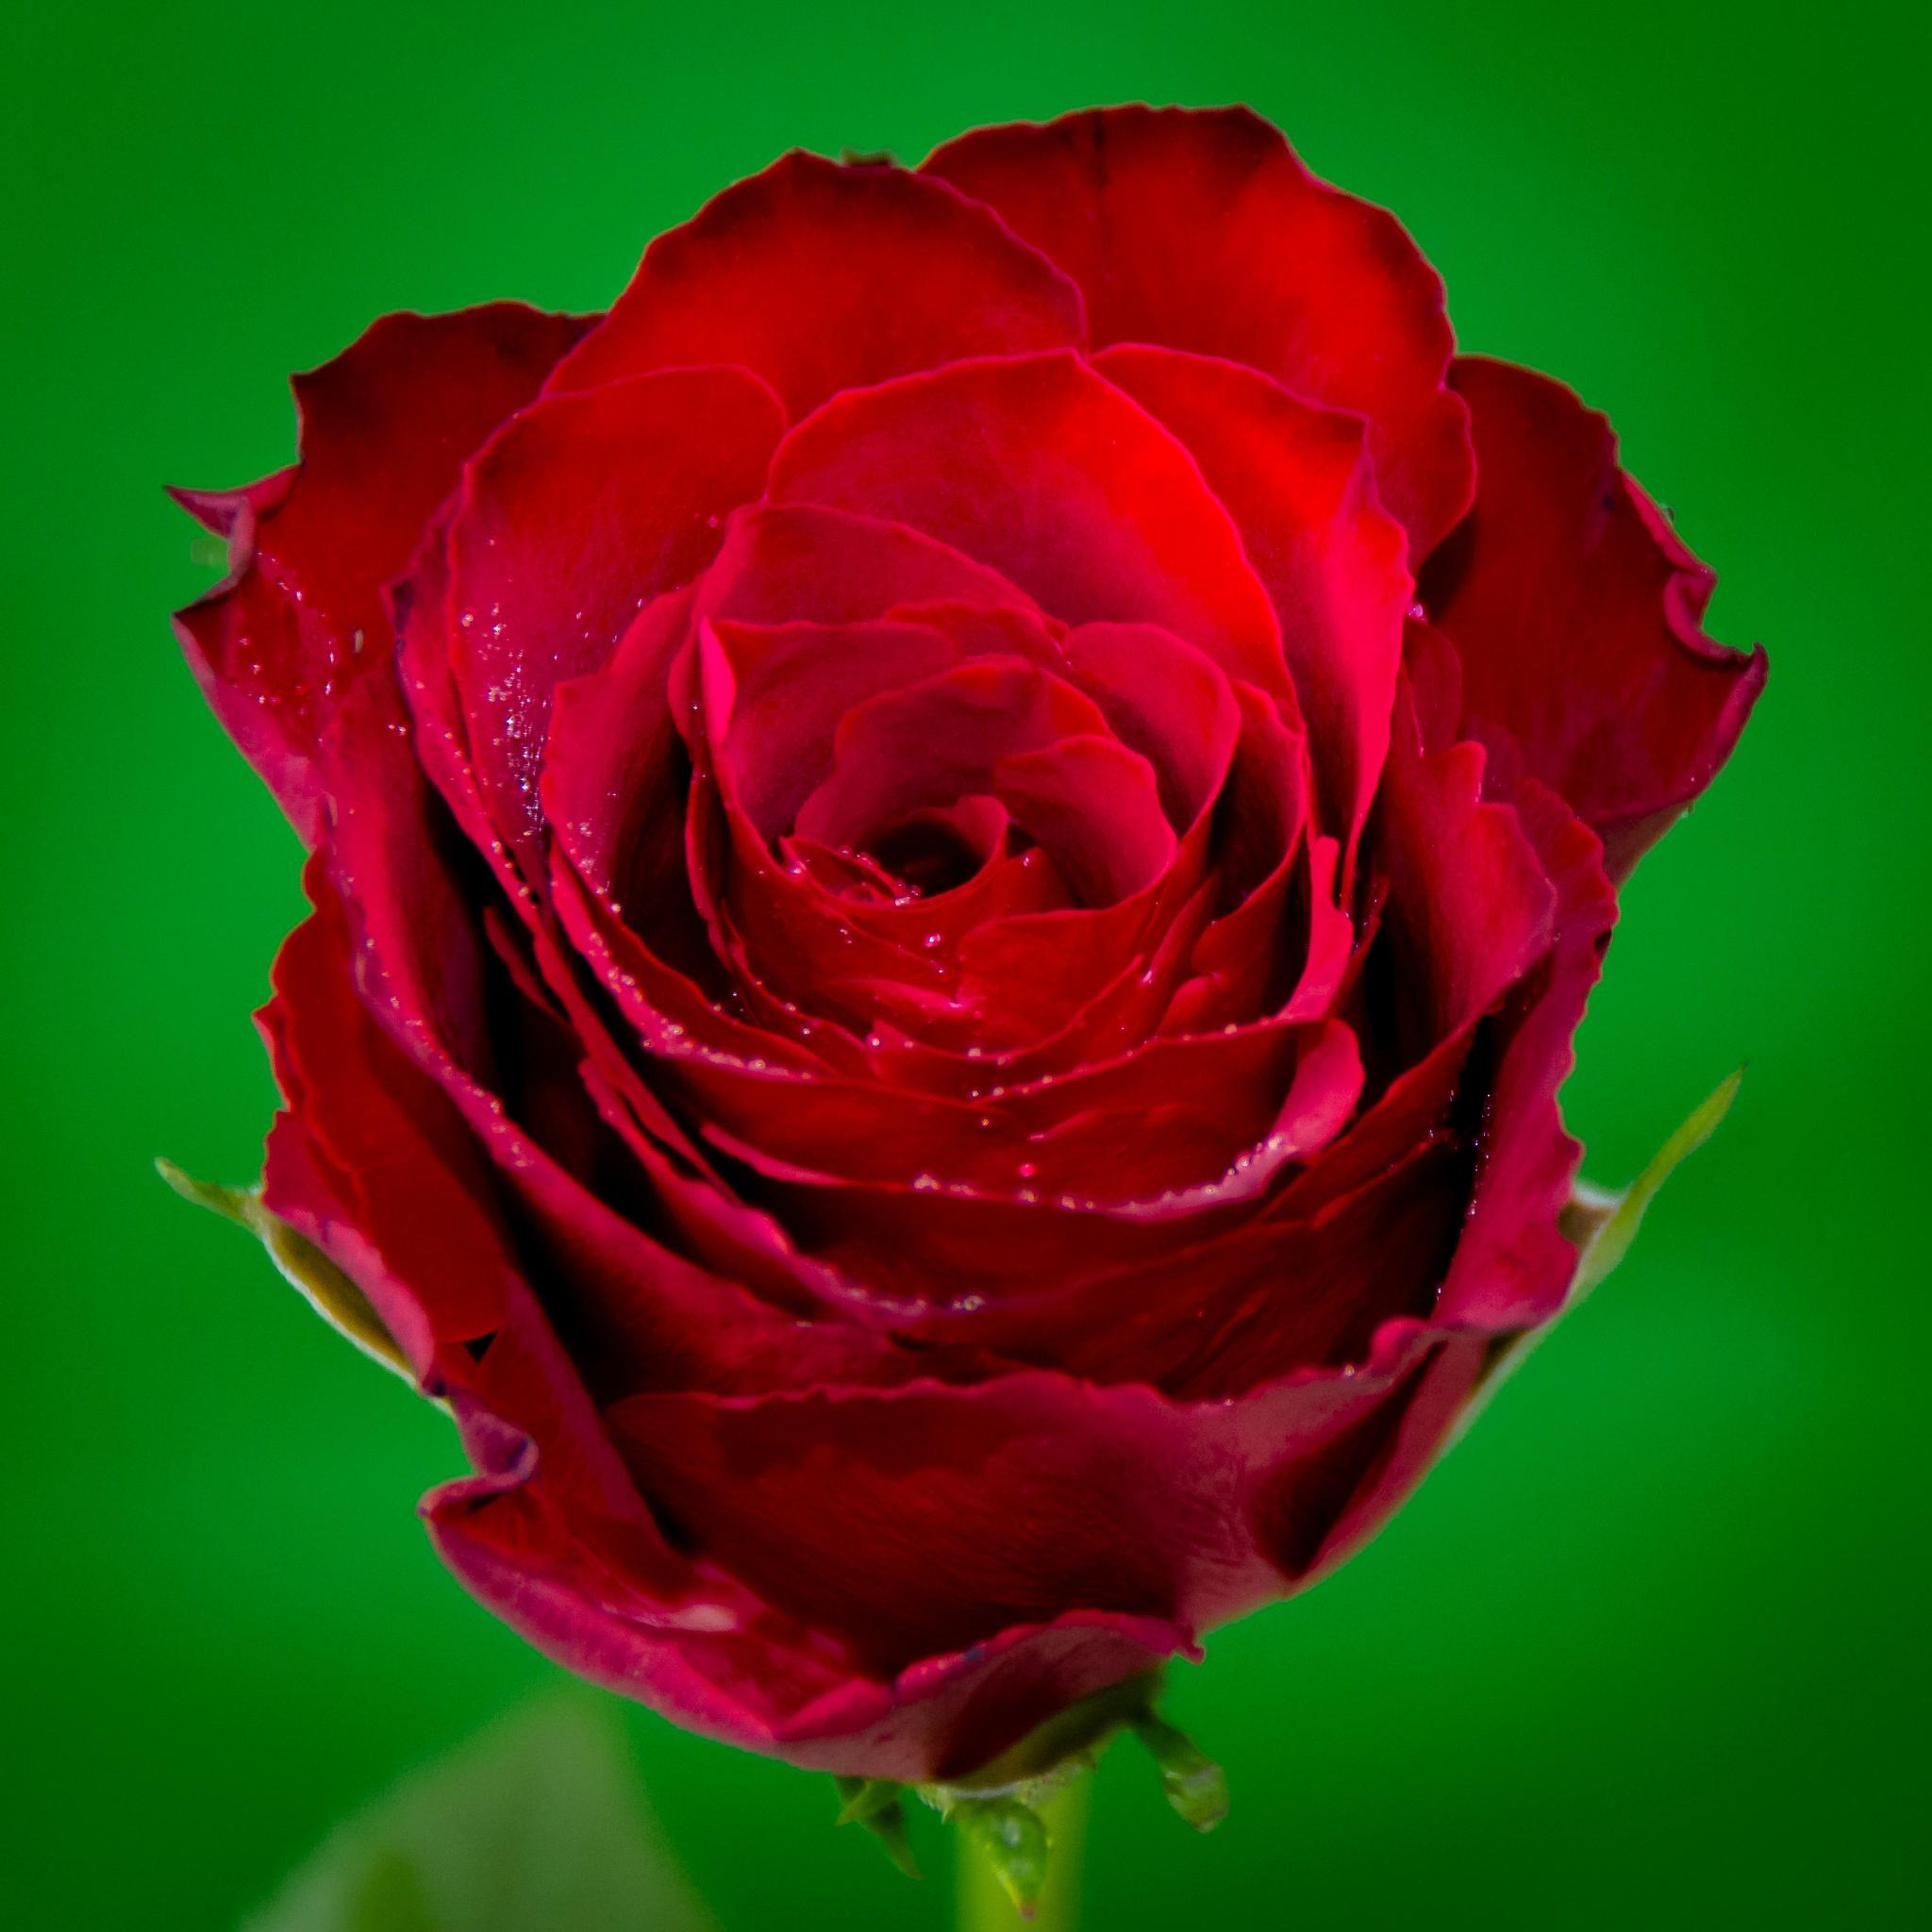 Rose by Kristof Maenhout